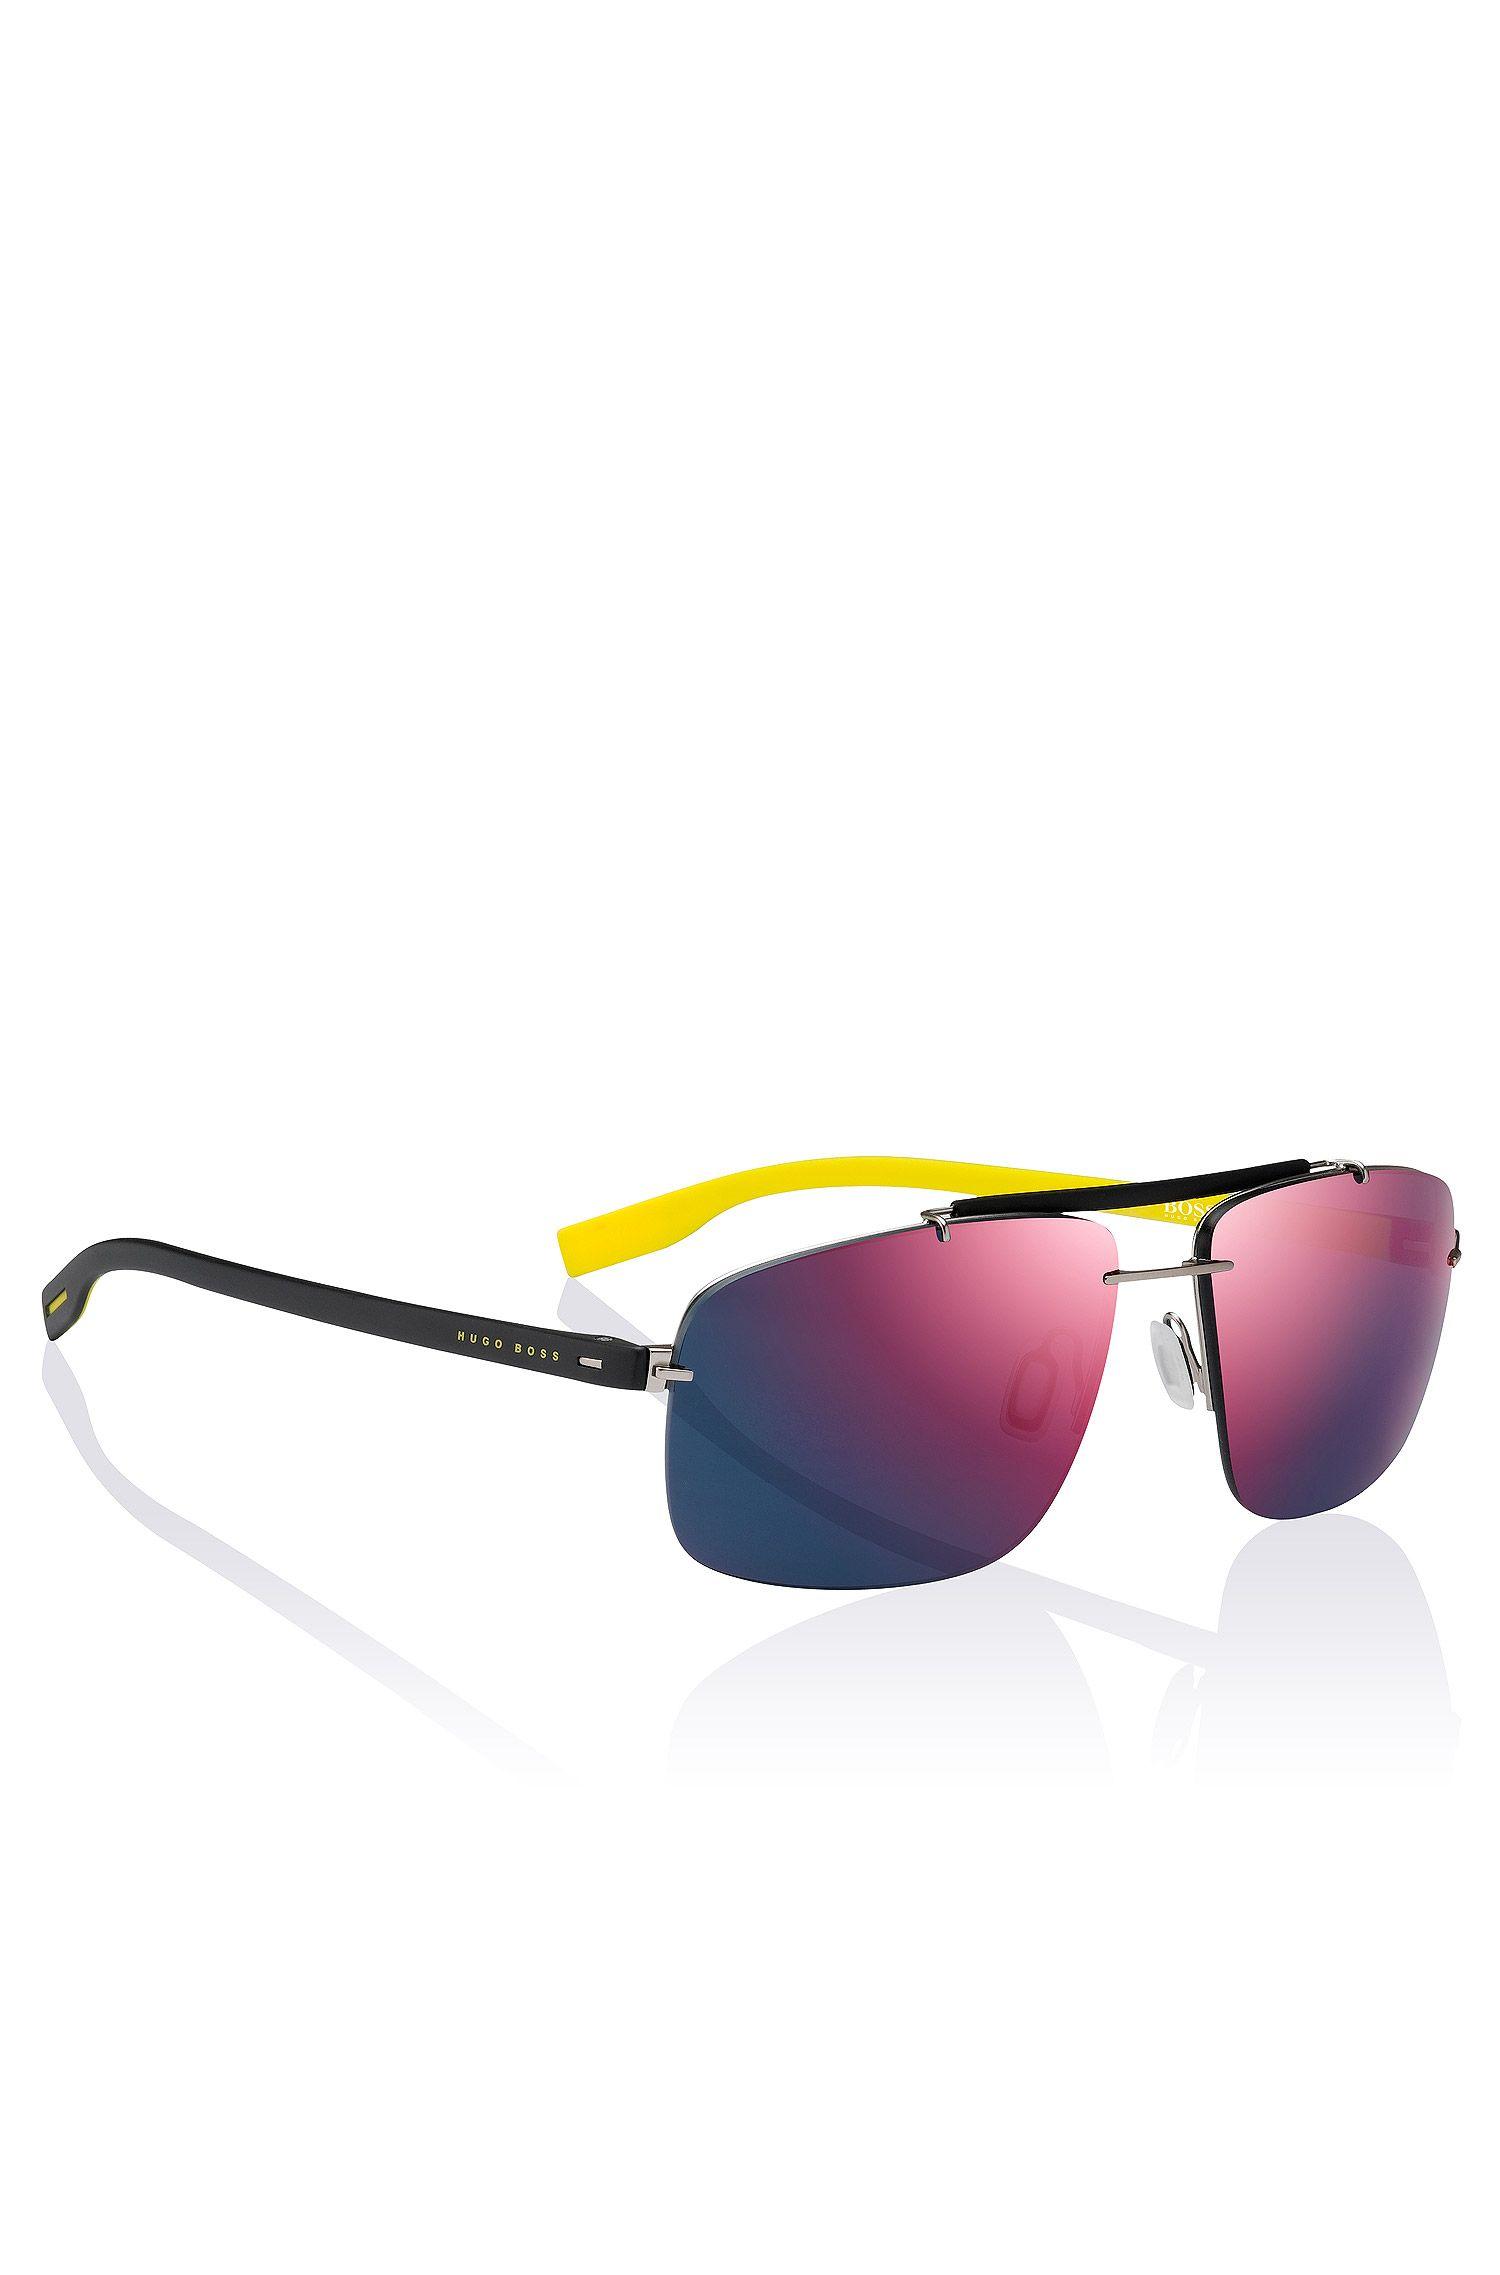 Sunglasses 'BOSS 0608/S', International Collection